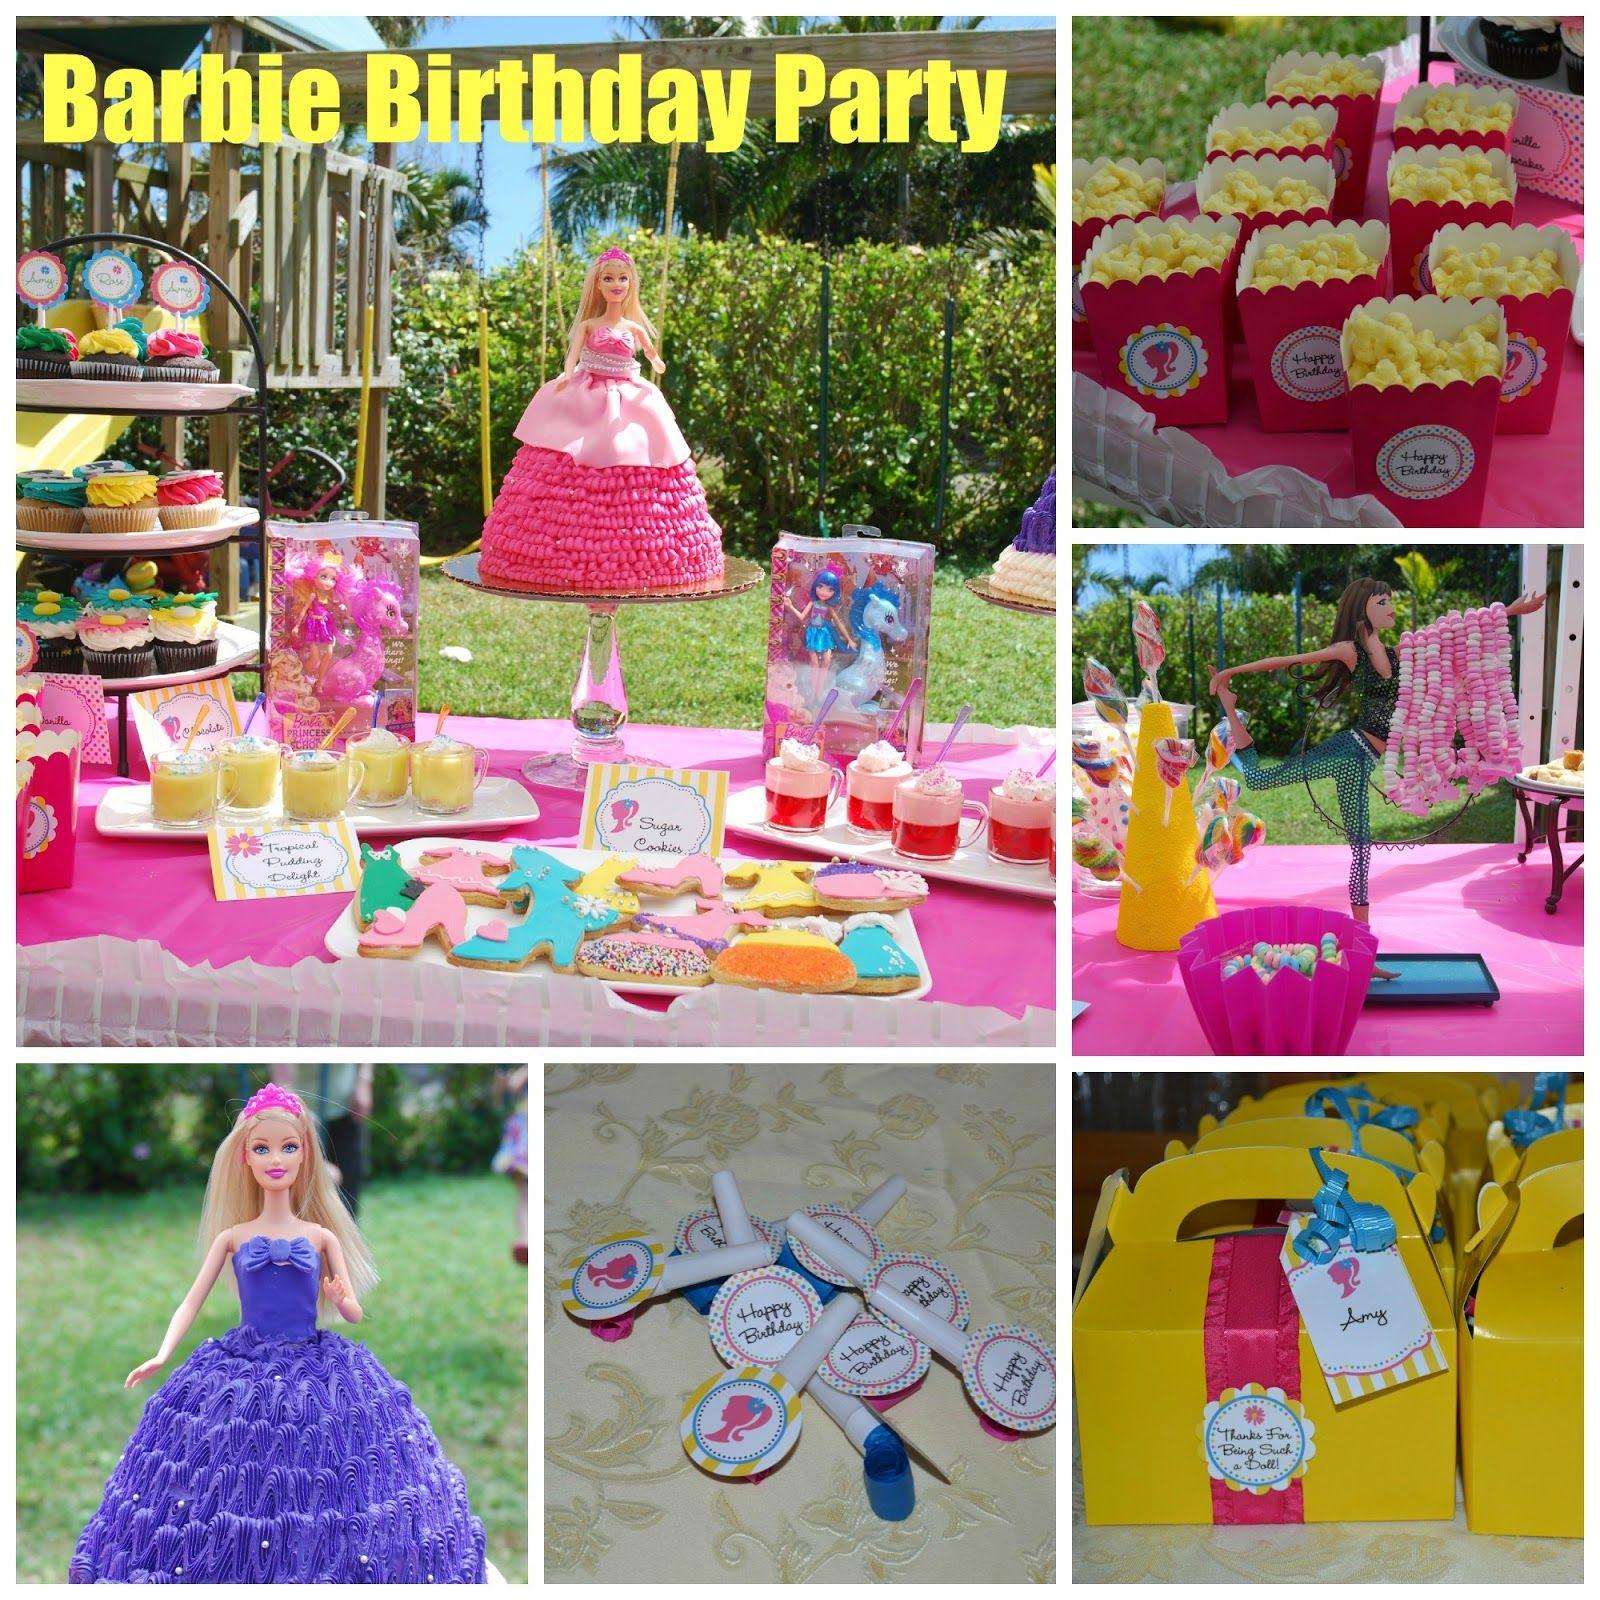 Food, Family, Fun.: Barbie Birthday Party